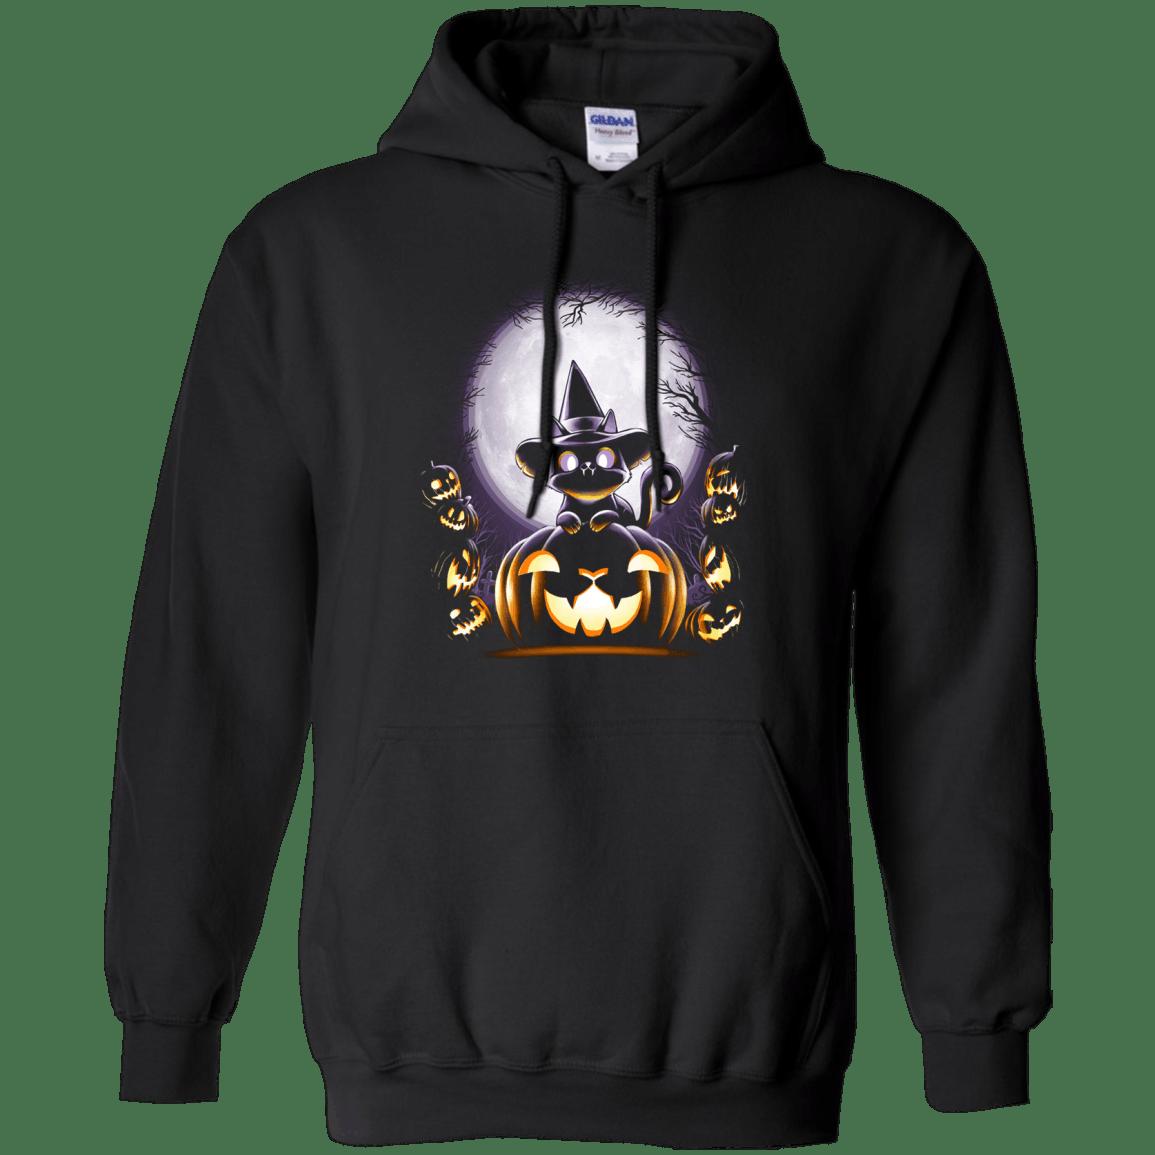 Witch Cat Night pumkin halloween Hoodie